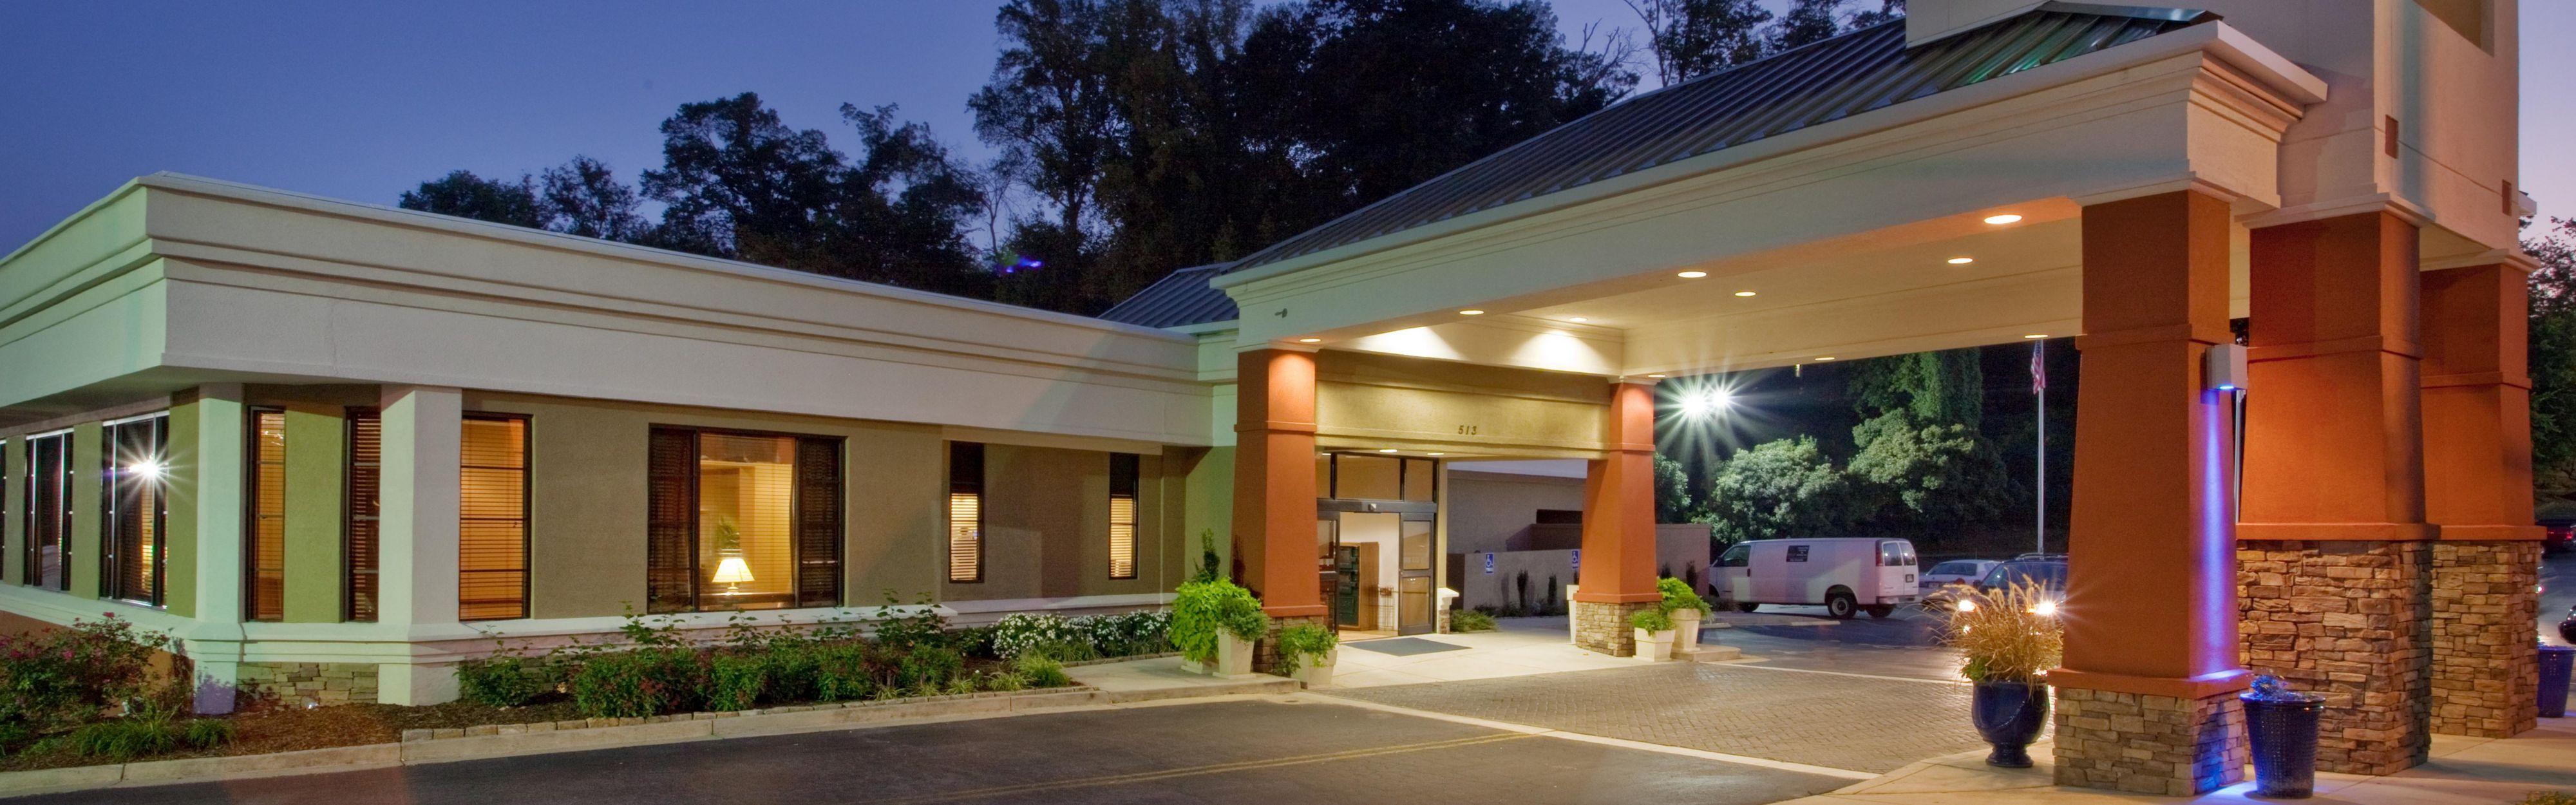 Holiday Inn Express Athens-University Area image 0